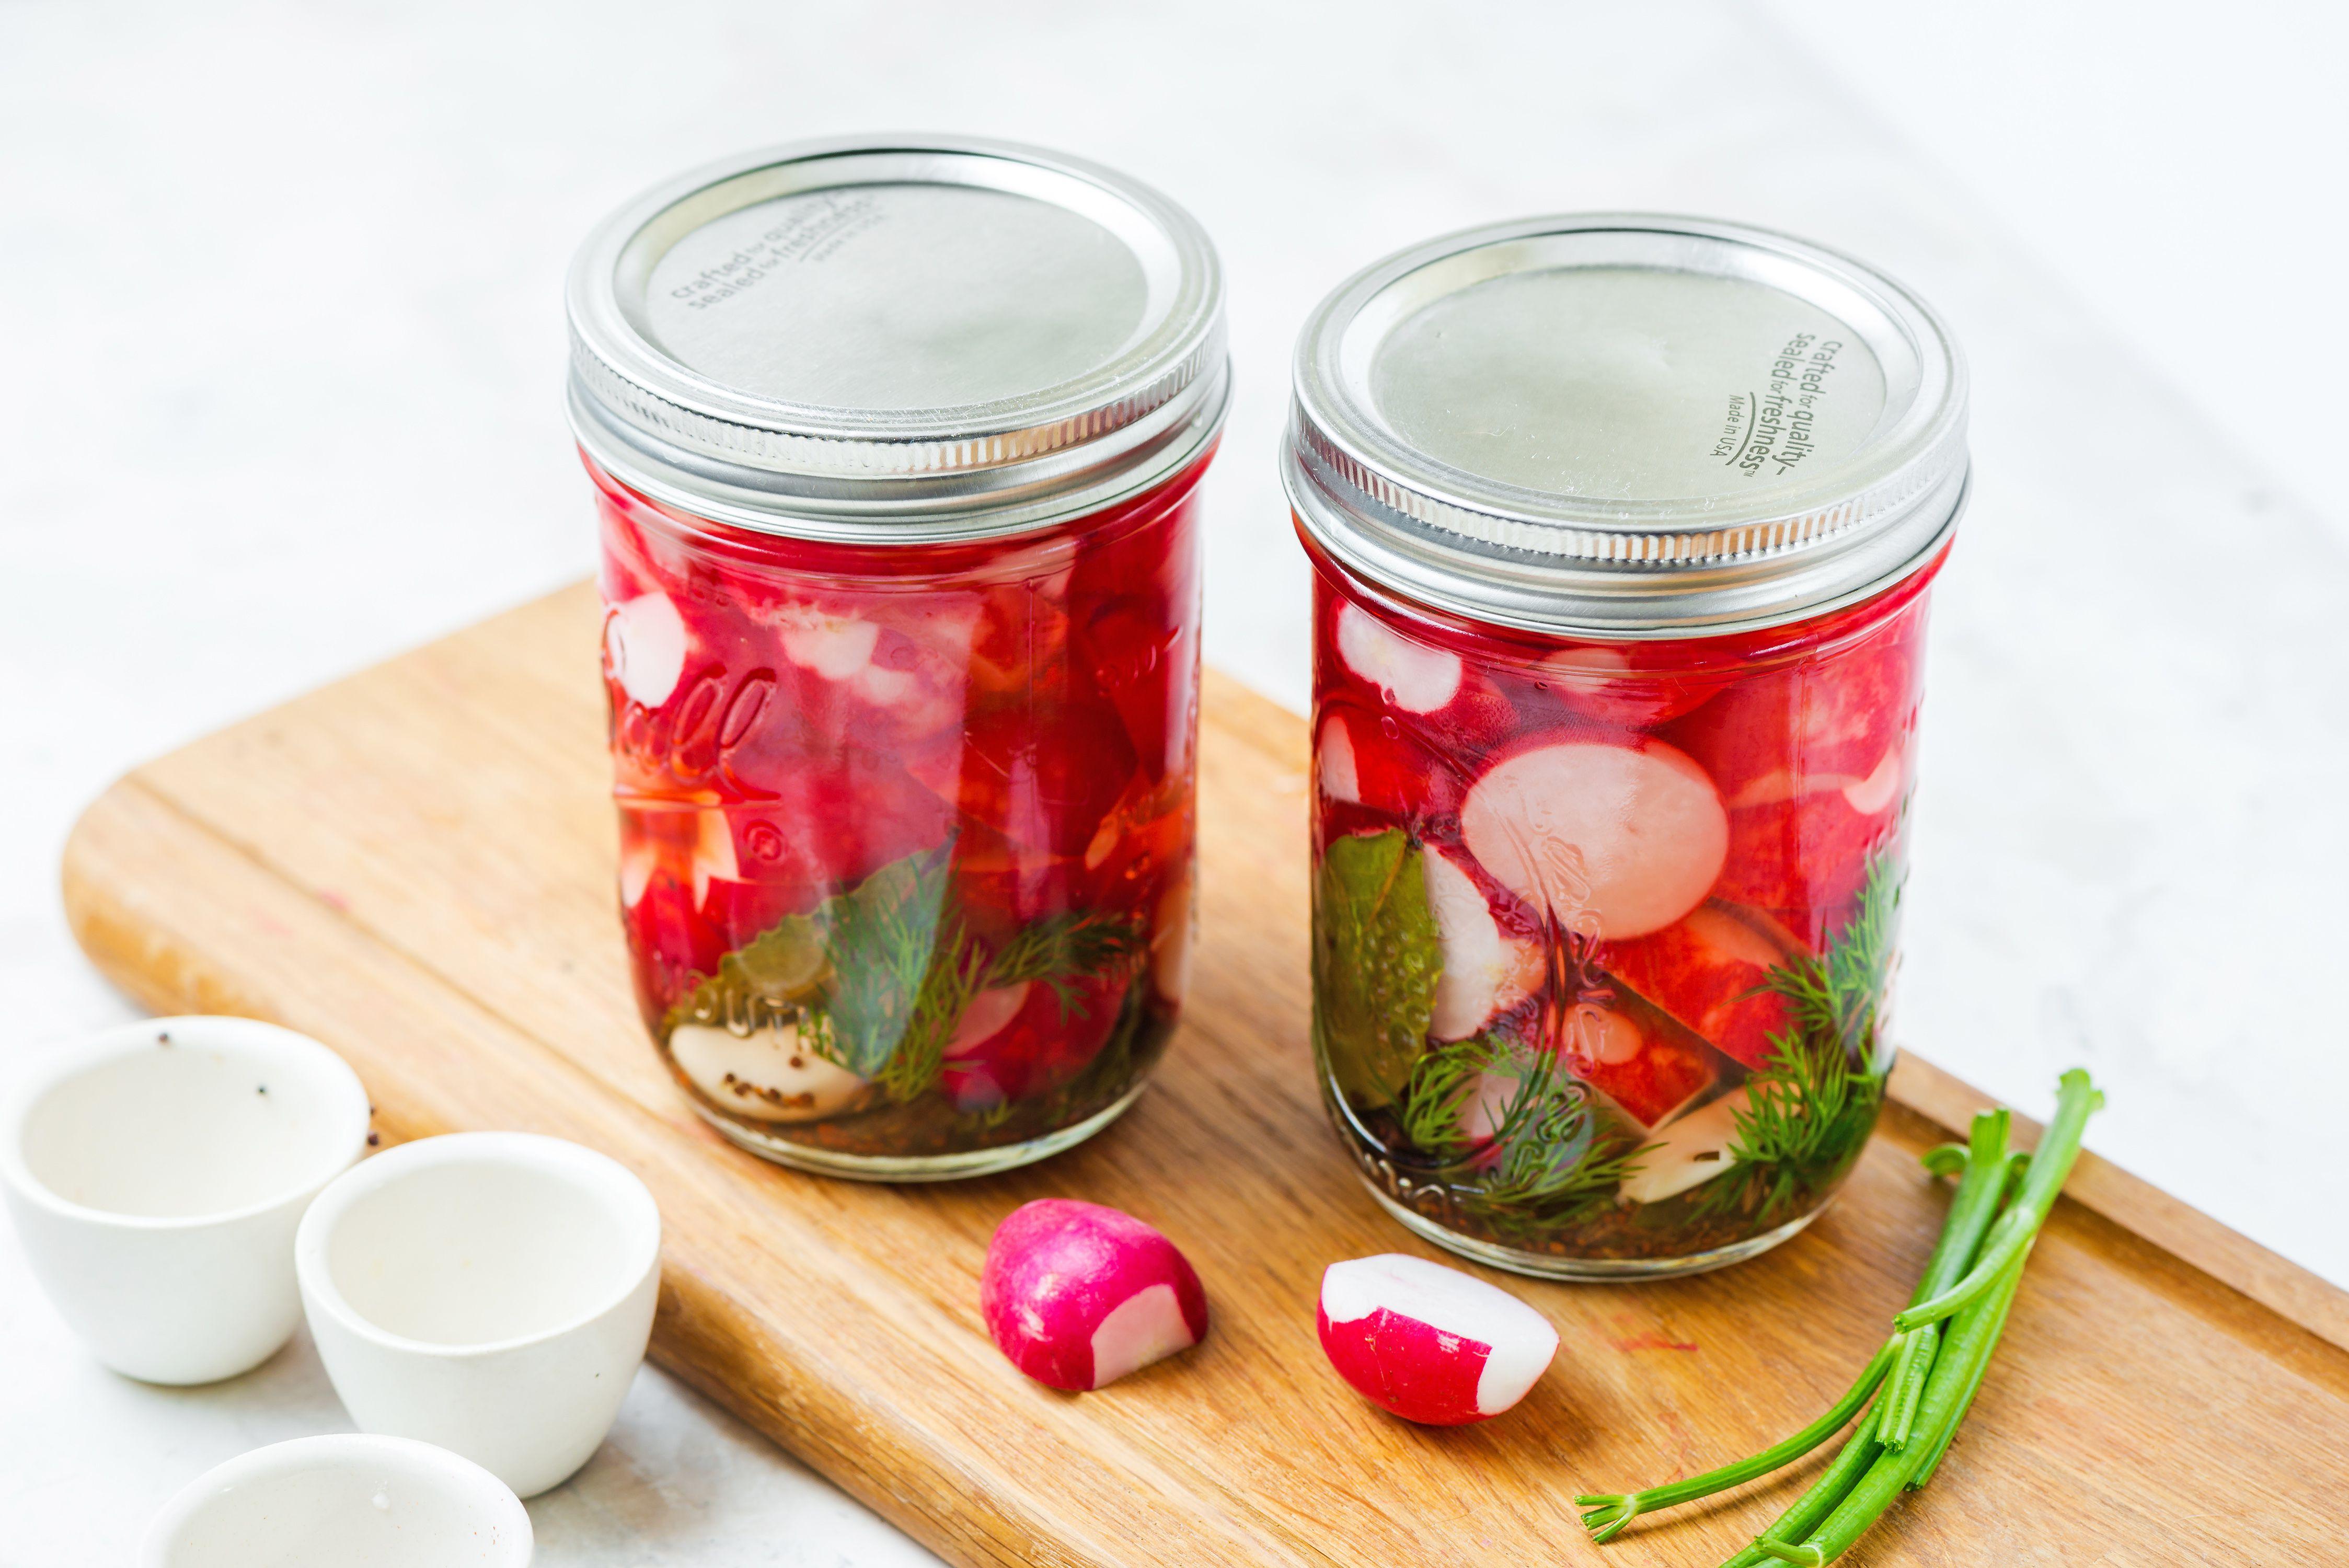 Tighten jar lid